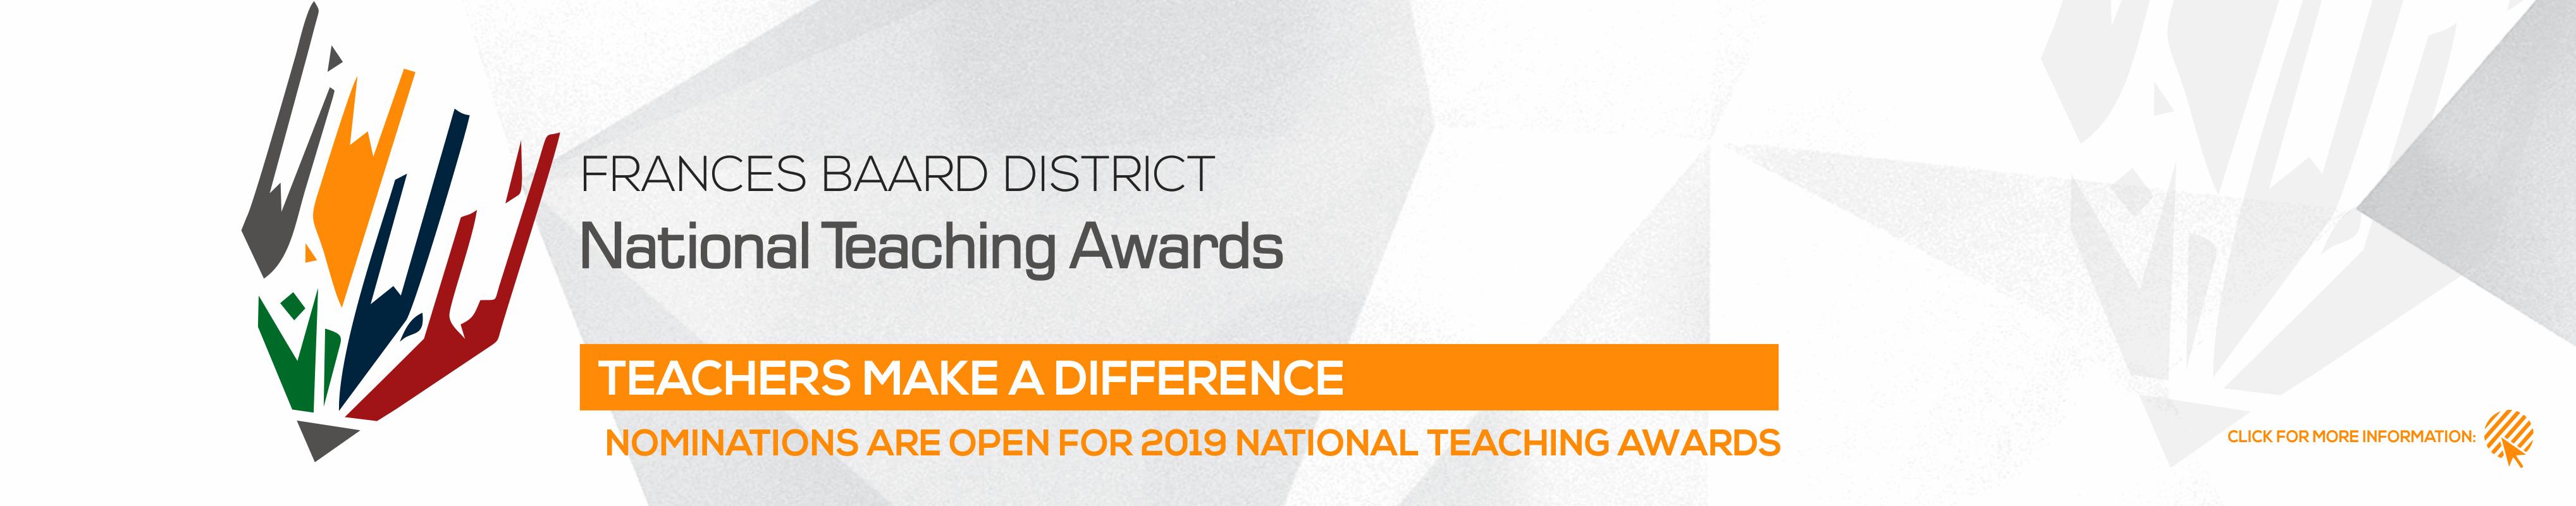 frances beeard district national teaching awards